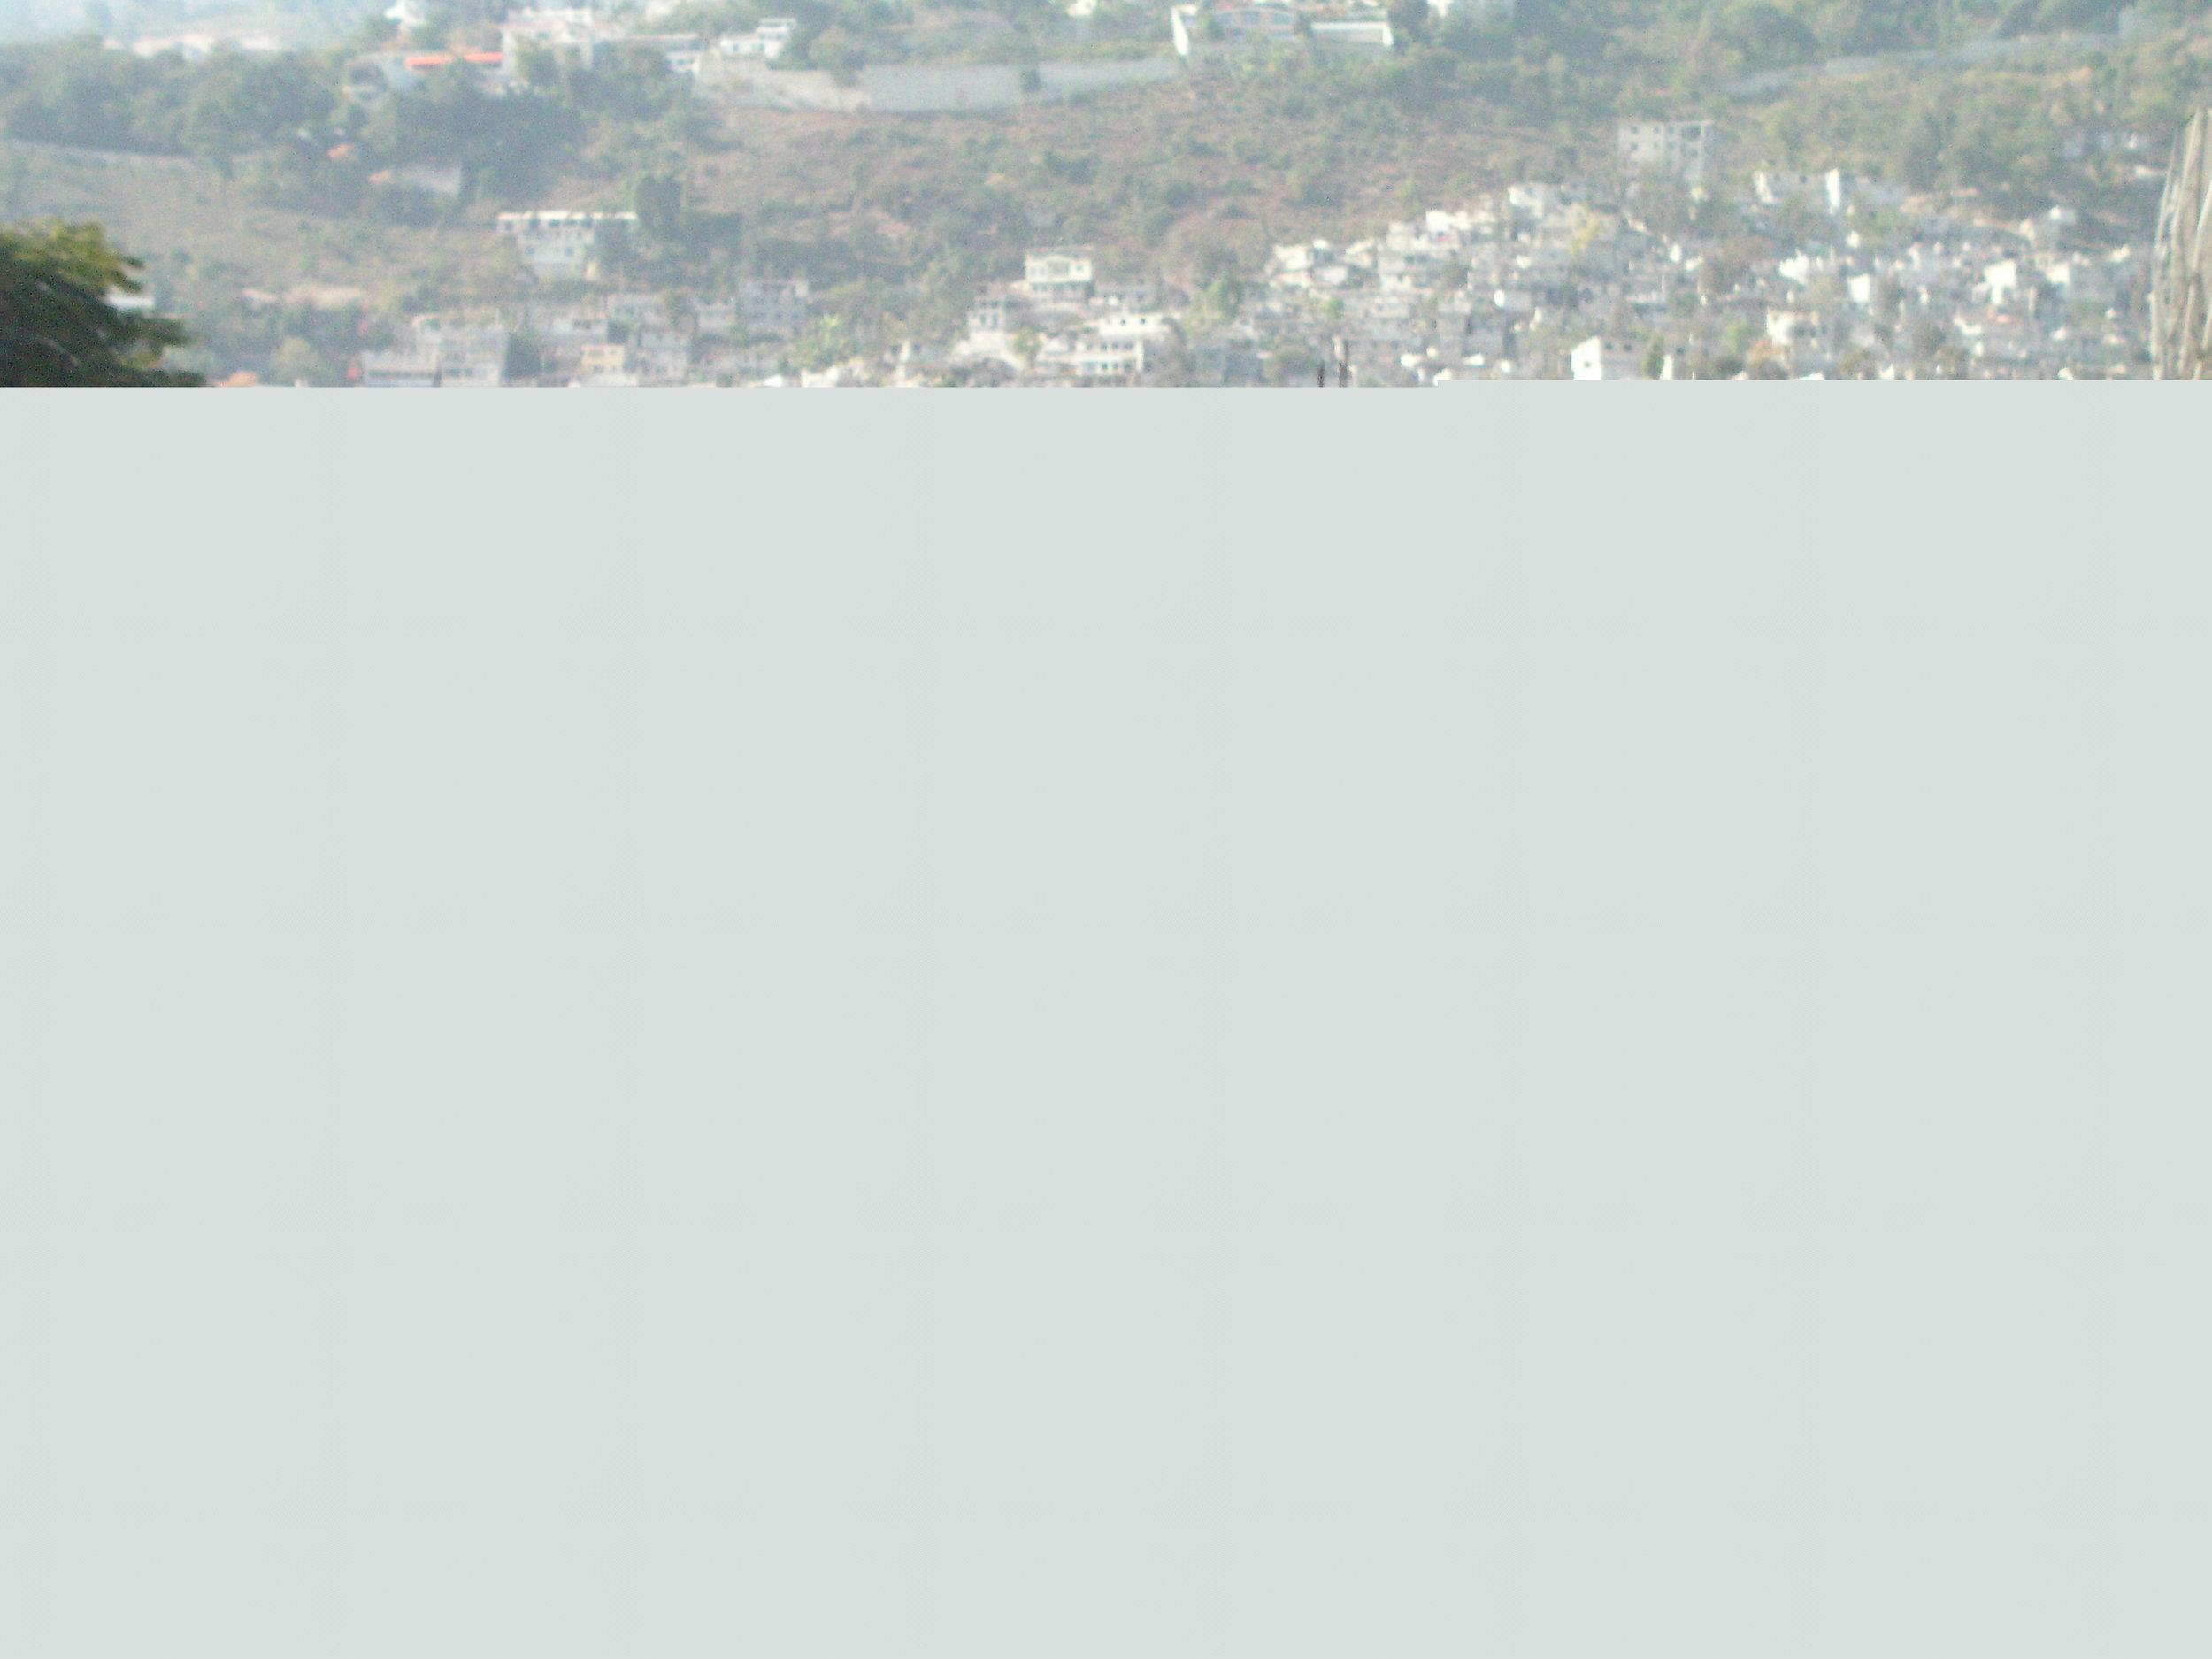 Haiti 10 (deleted 3c314250-2ccd66-a50340d8).JPG